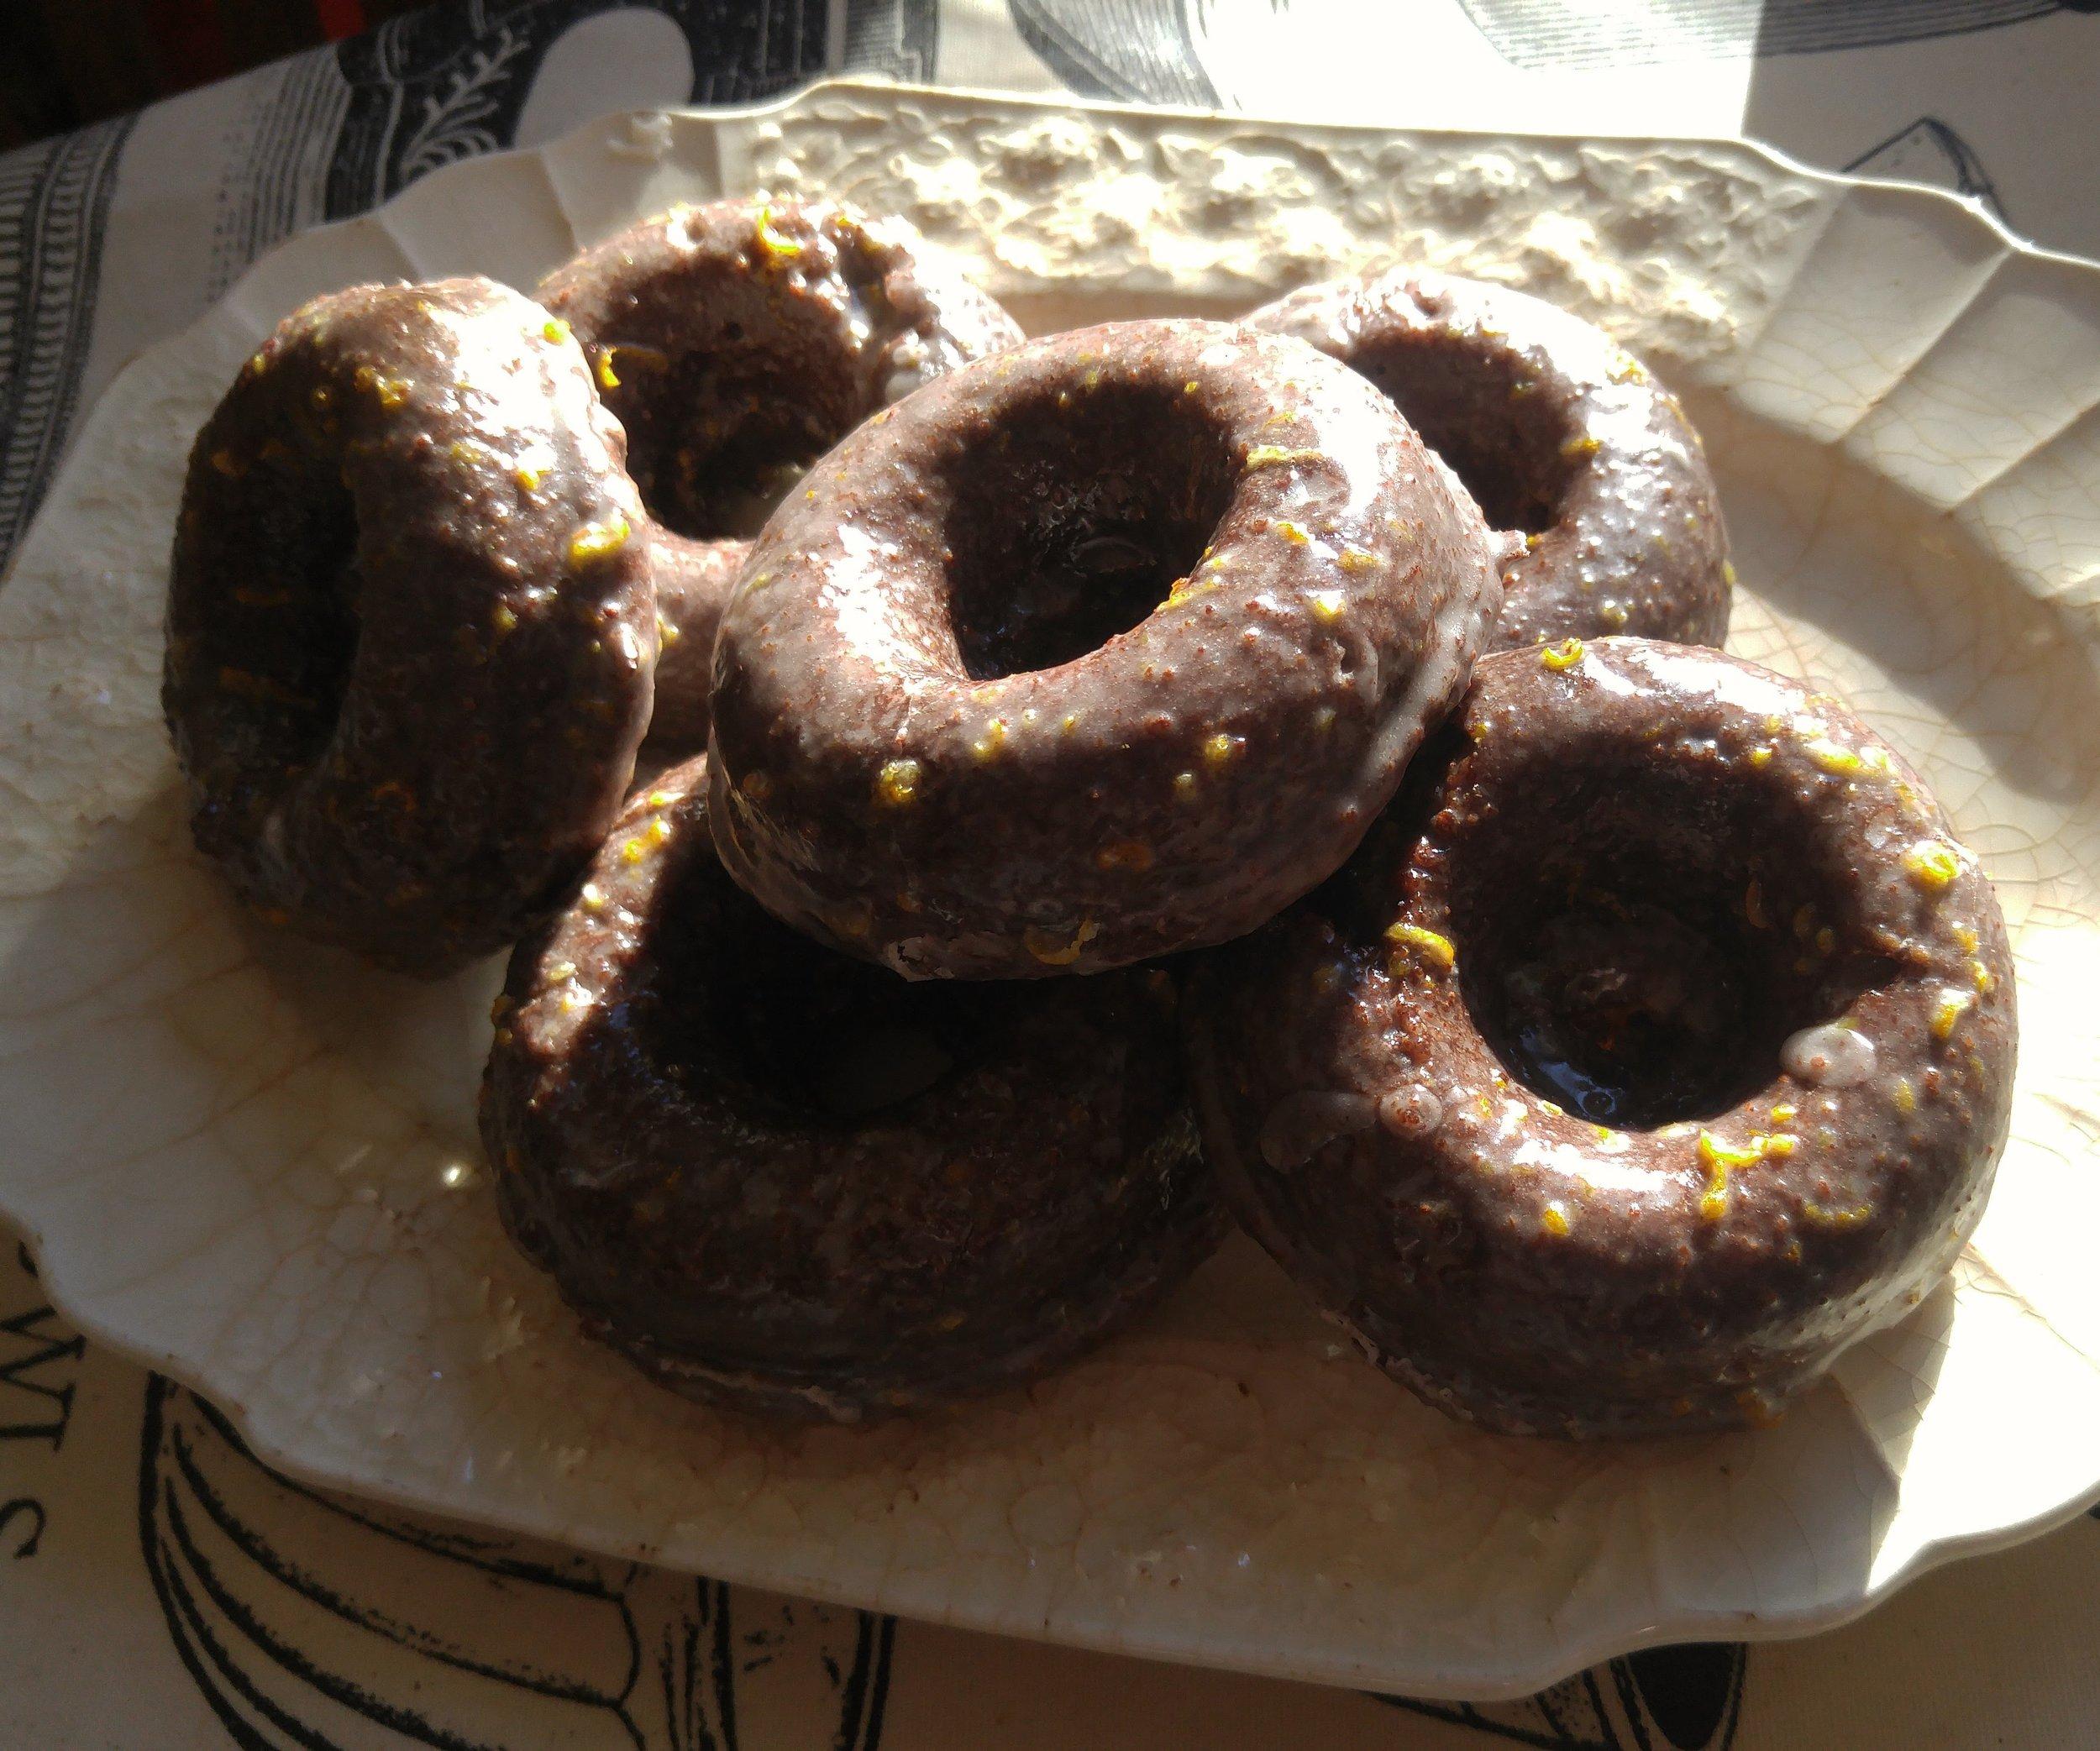 Beet & Chocolate baked doughnuts with Sumac & Citrus glaze